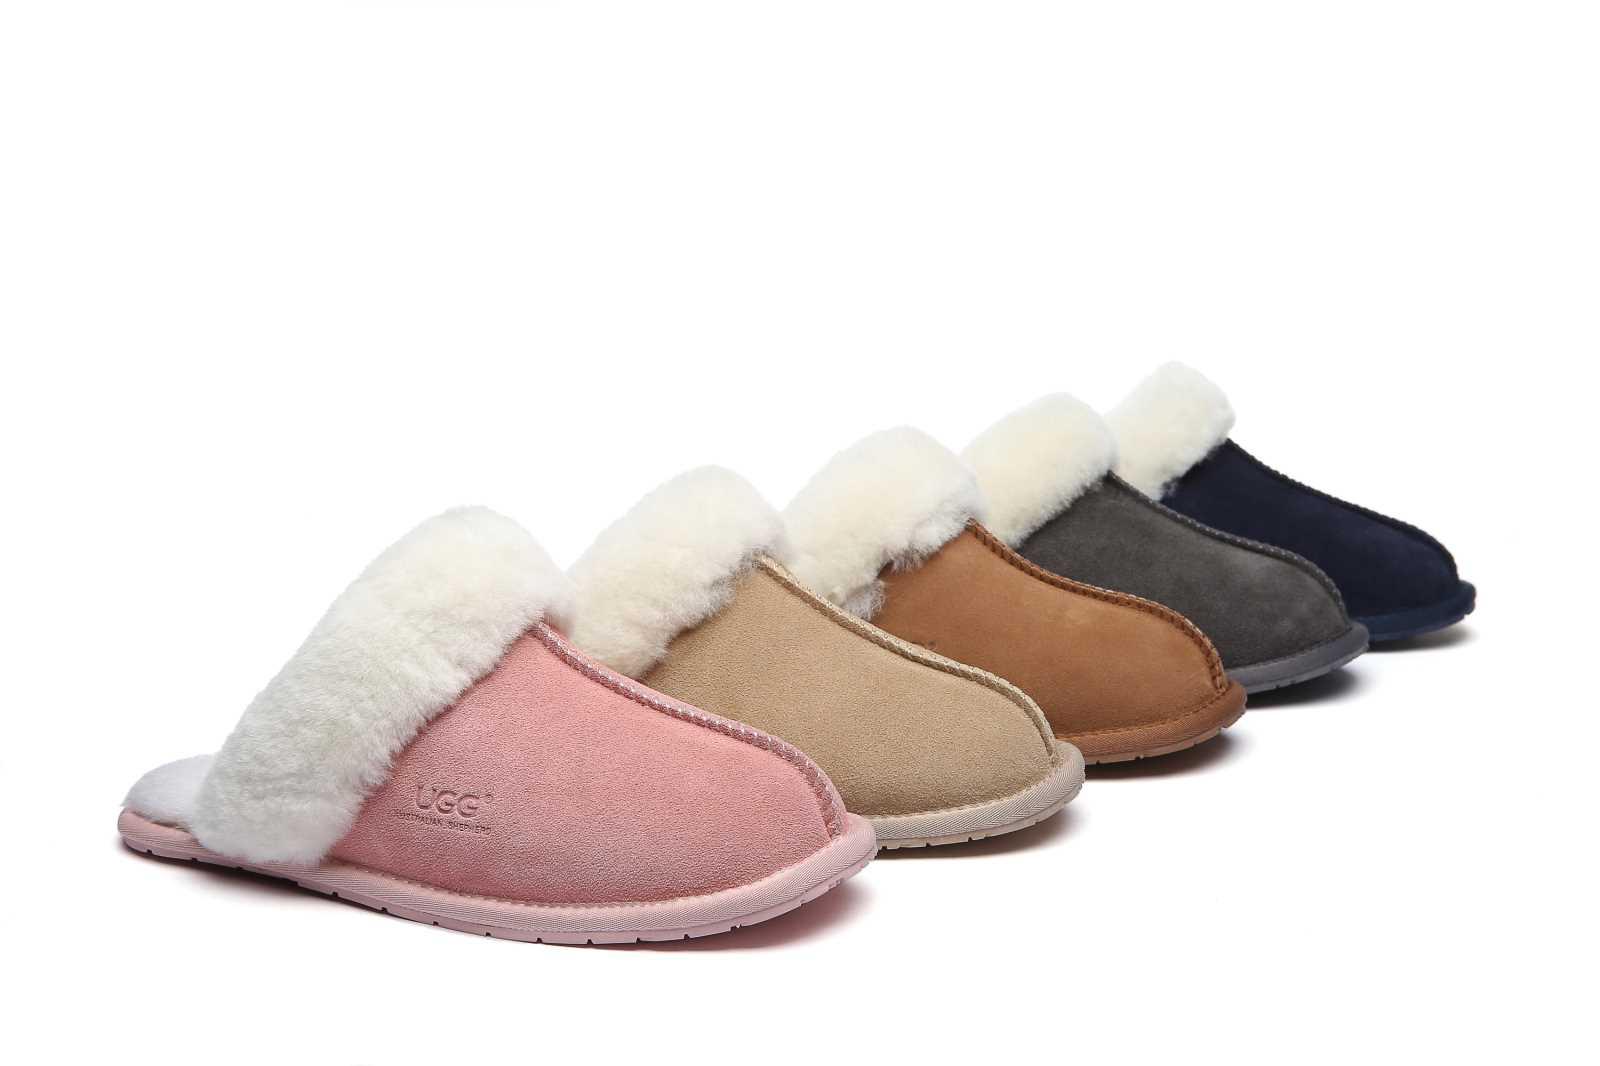 UGG-Rosa-Home-Slippers-Scuffs-Premium-Australian-Sheepskin-Lining-Insole